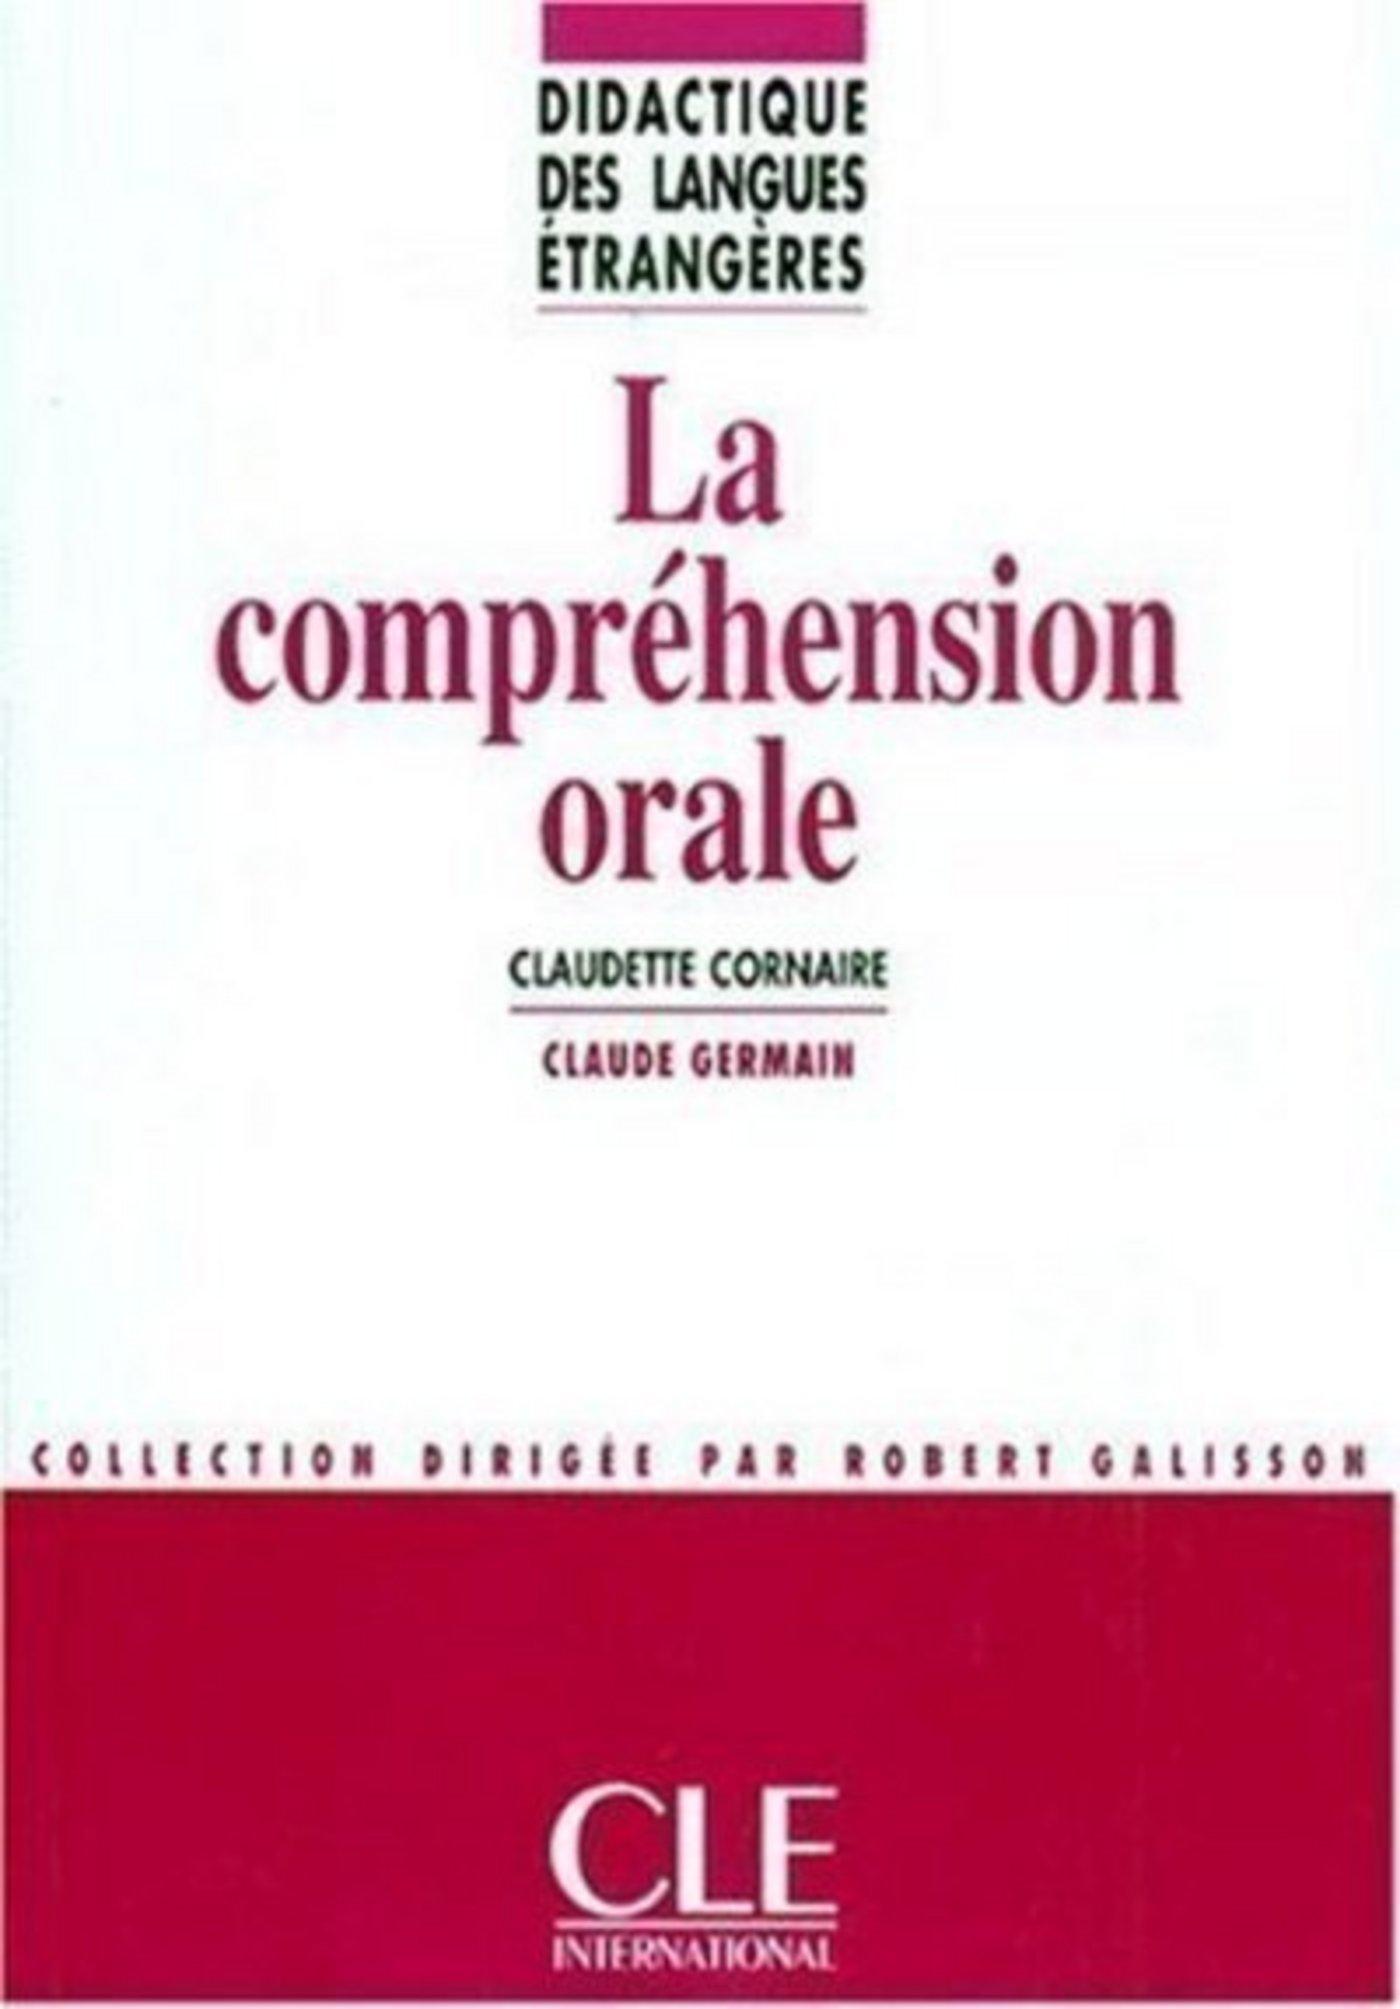 La compréhension orale - Didactique des langues étrangères - Ebook (ebook)